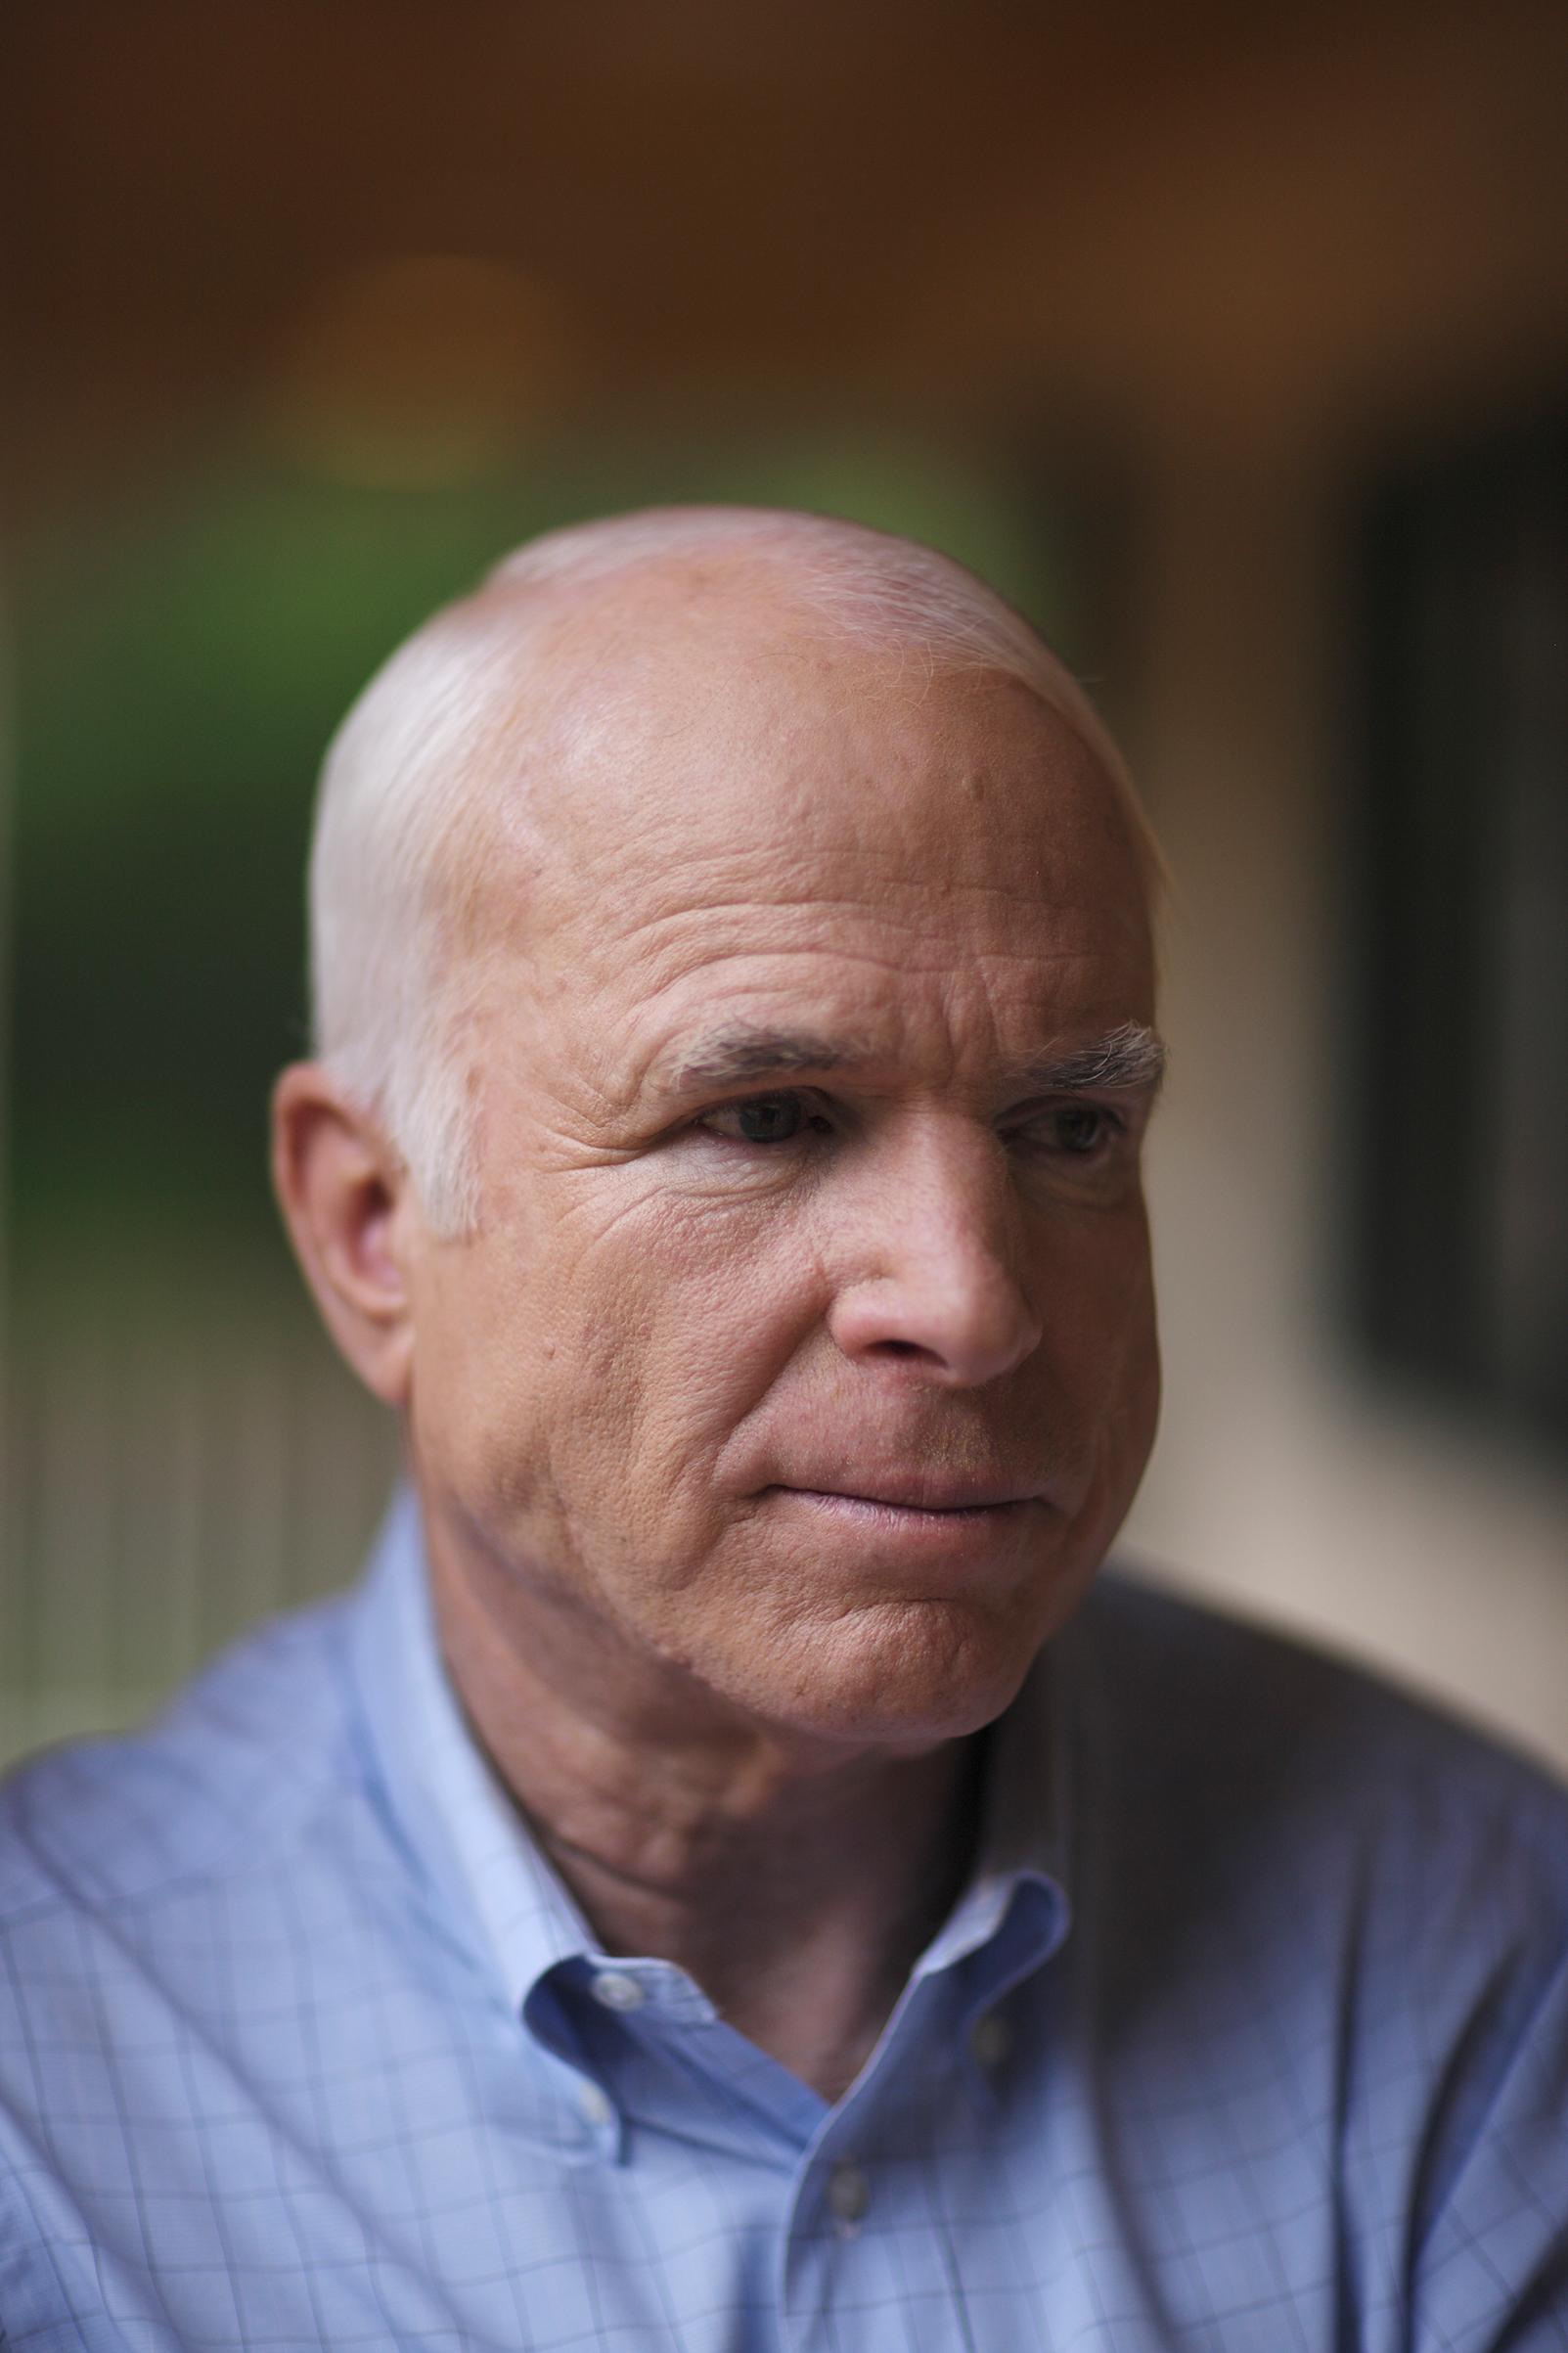 John McCain at his ranch outside Sedona, Arizona on August 23, 2008.